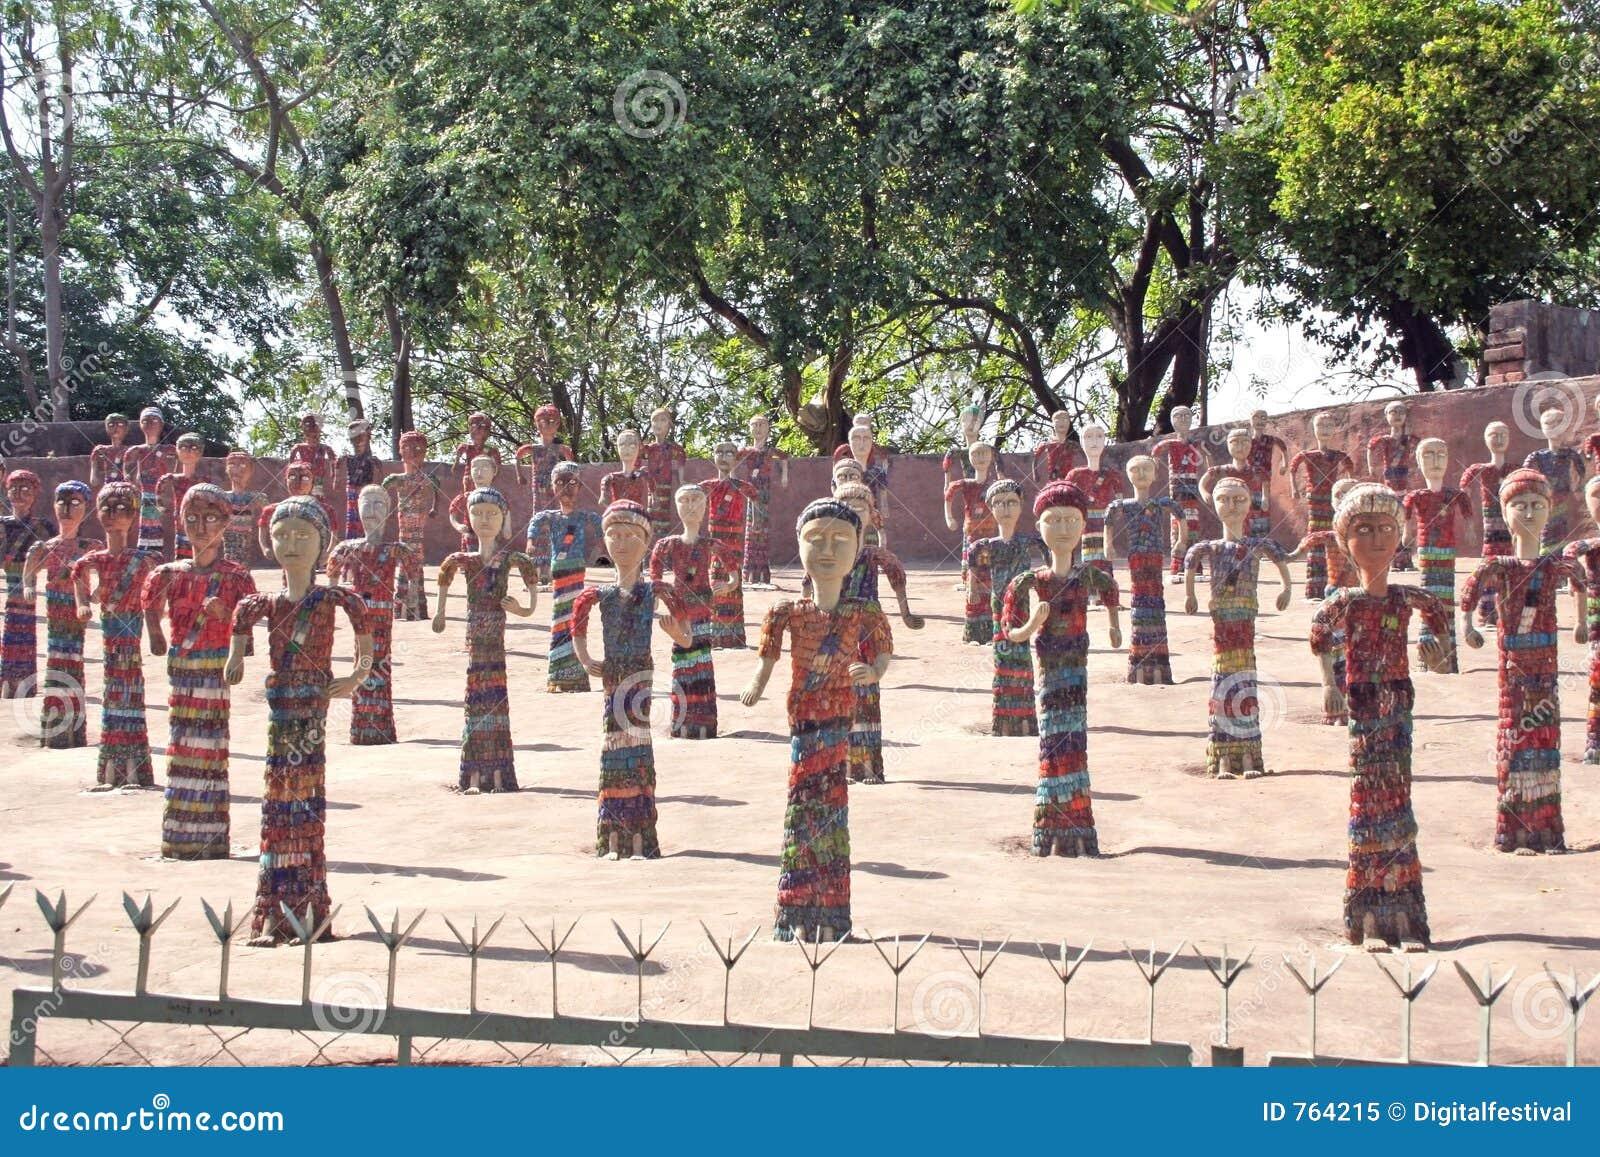 Rock Garden Figurines Chandigarh India Royalty Free Stock